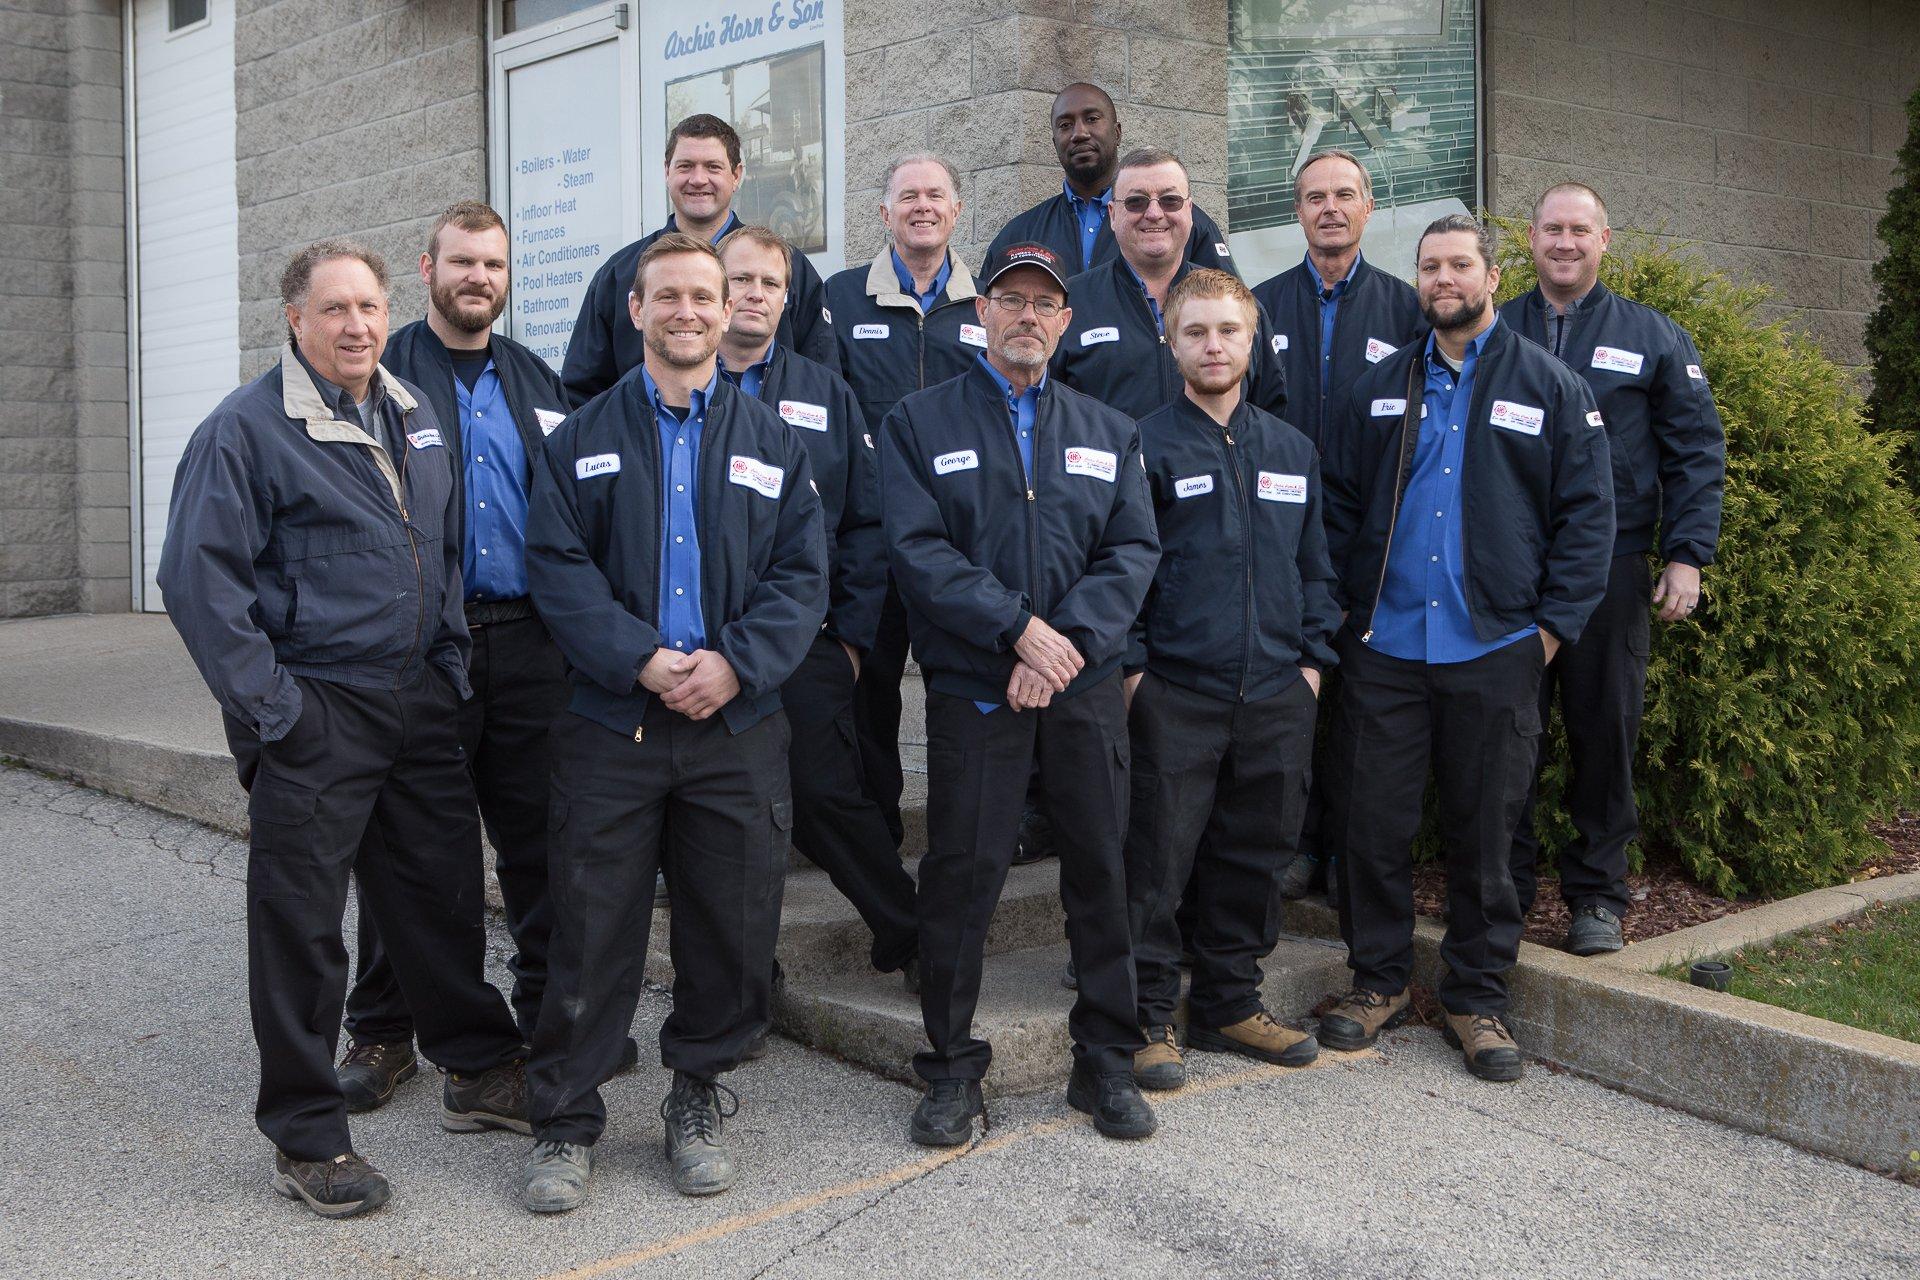 Hamilton Plumber Plumbing Amp Hvac Services Archie Horn